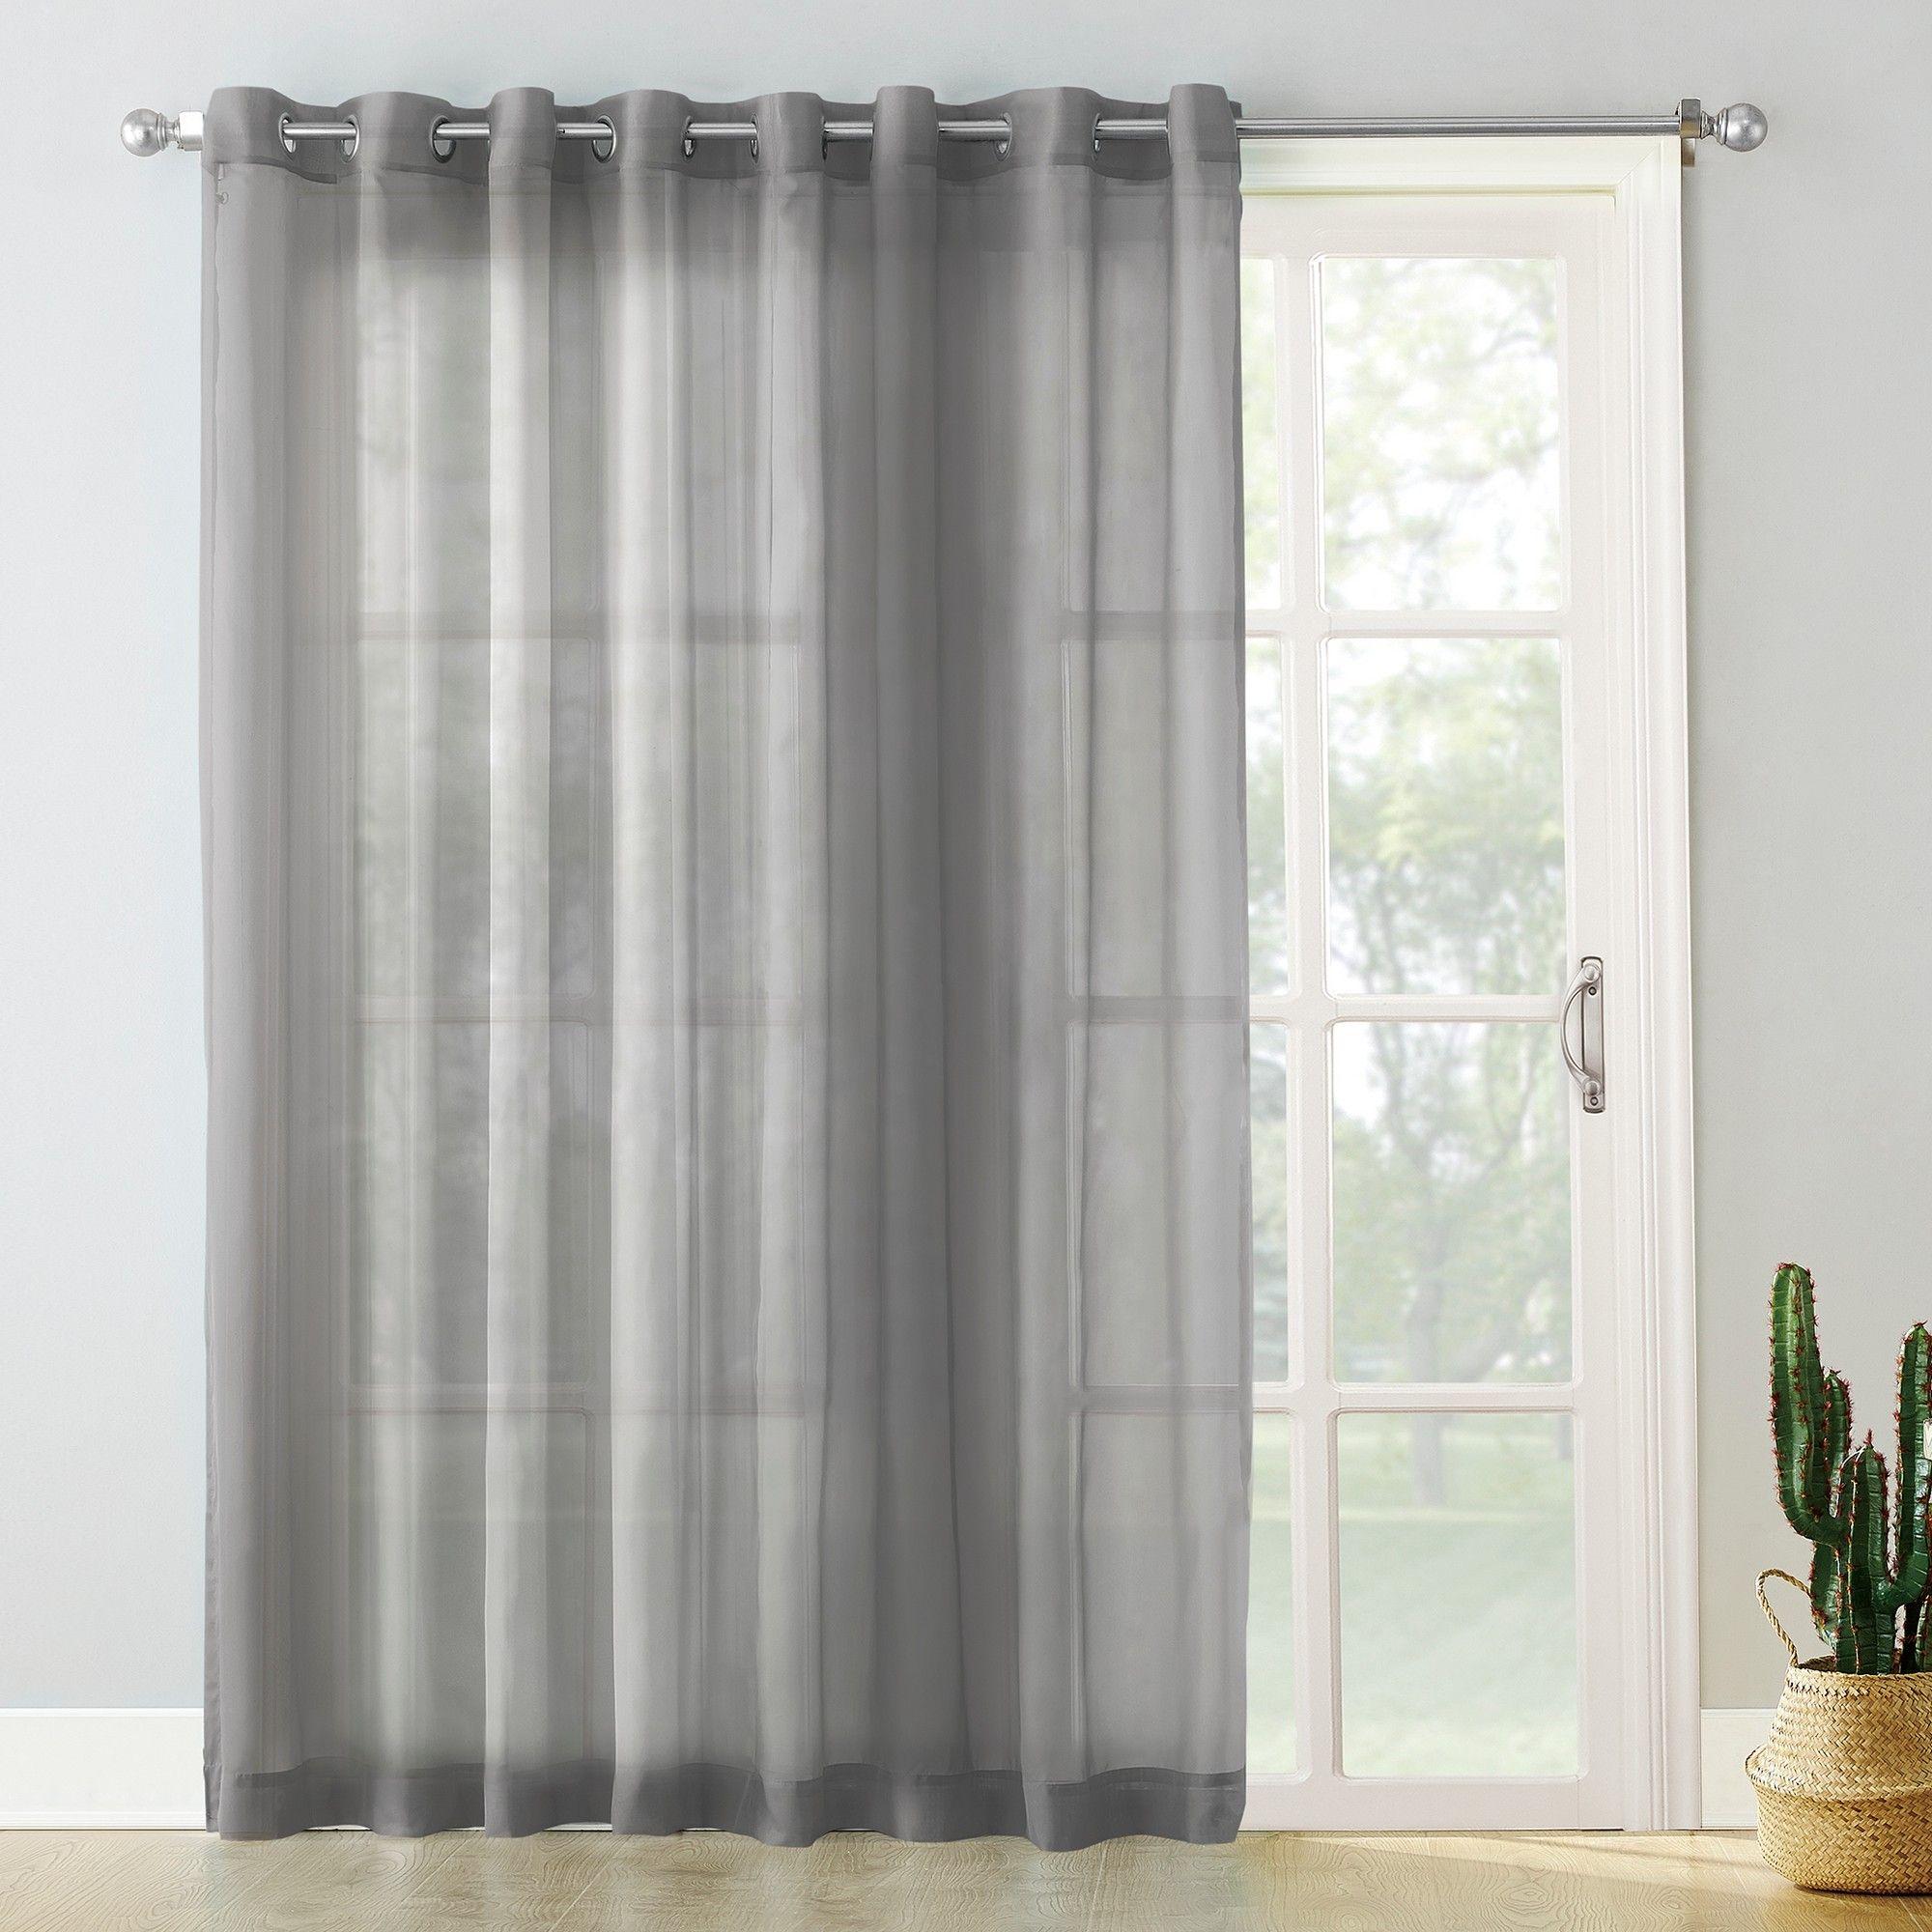 Emily Extra Wide Sheer Voile Sliding Door Patio Curtain Panel Charcoal 100 X84 No 918 Patio Door Curtains Sliding Patio Doors